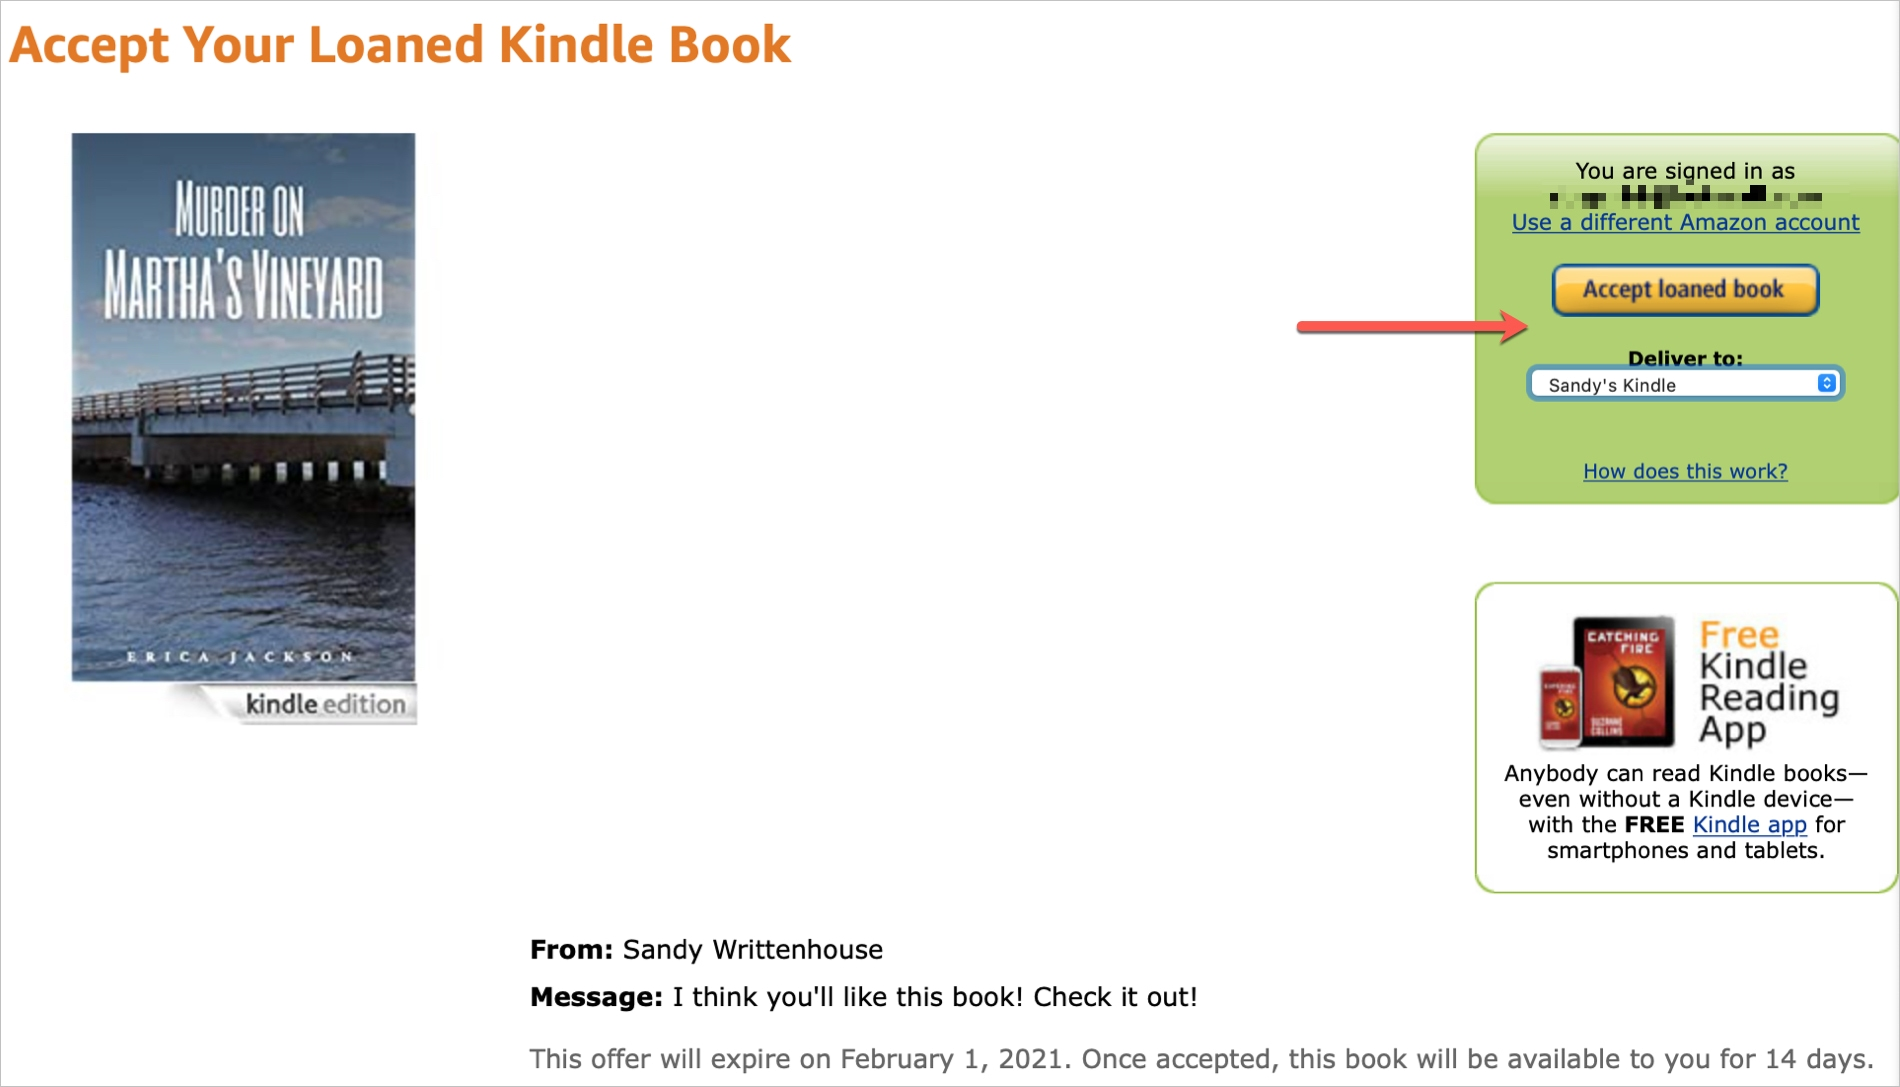 Amazon Kindle Accept Loaned Book